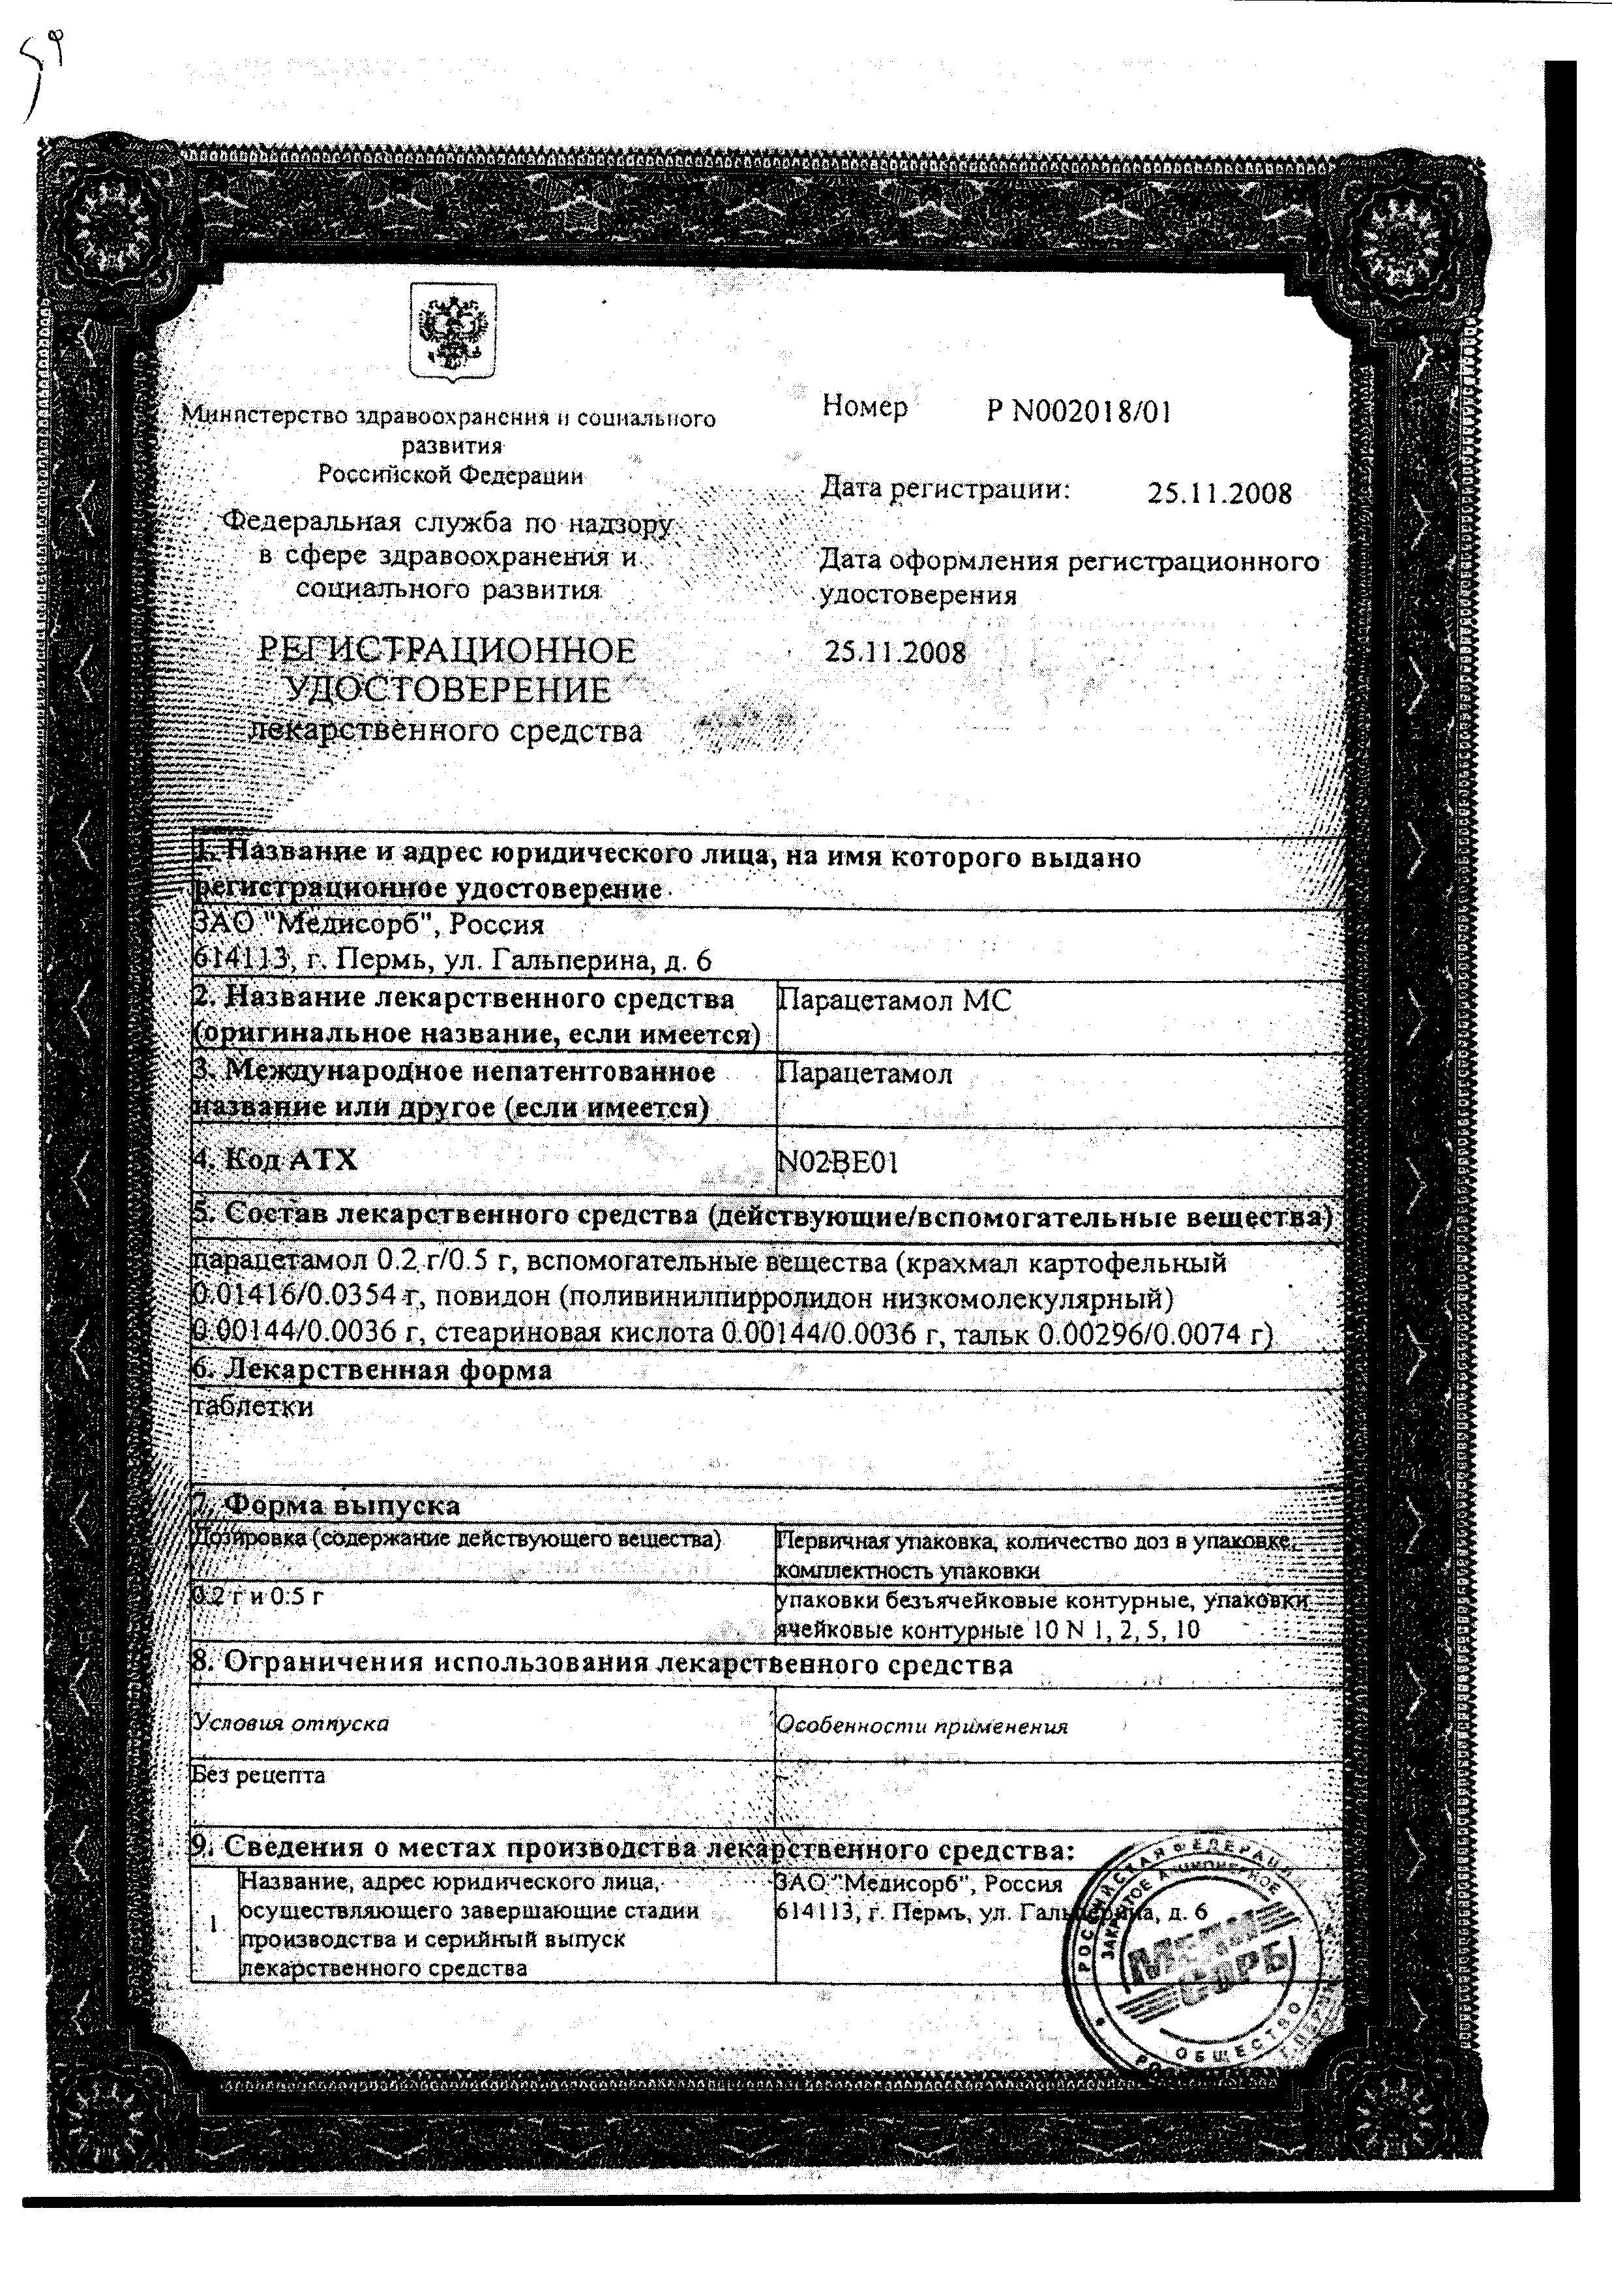 Парацетамол МС сертификат